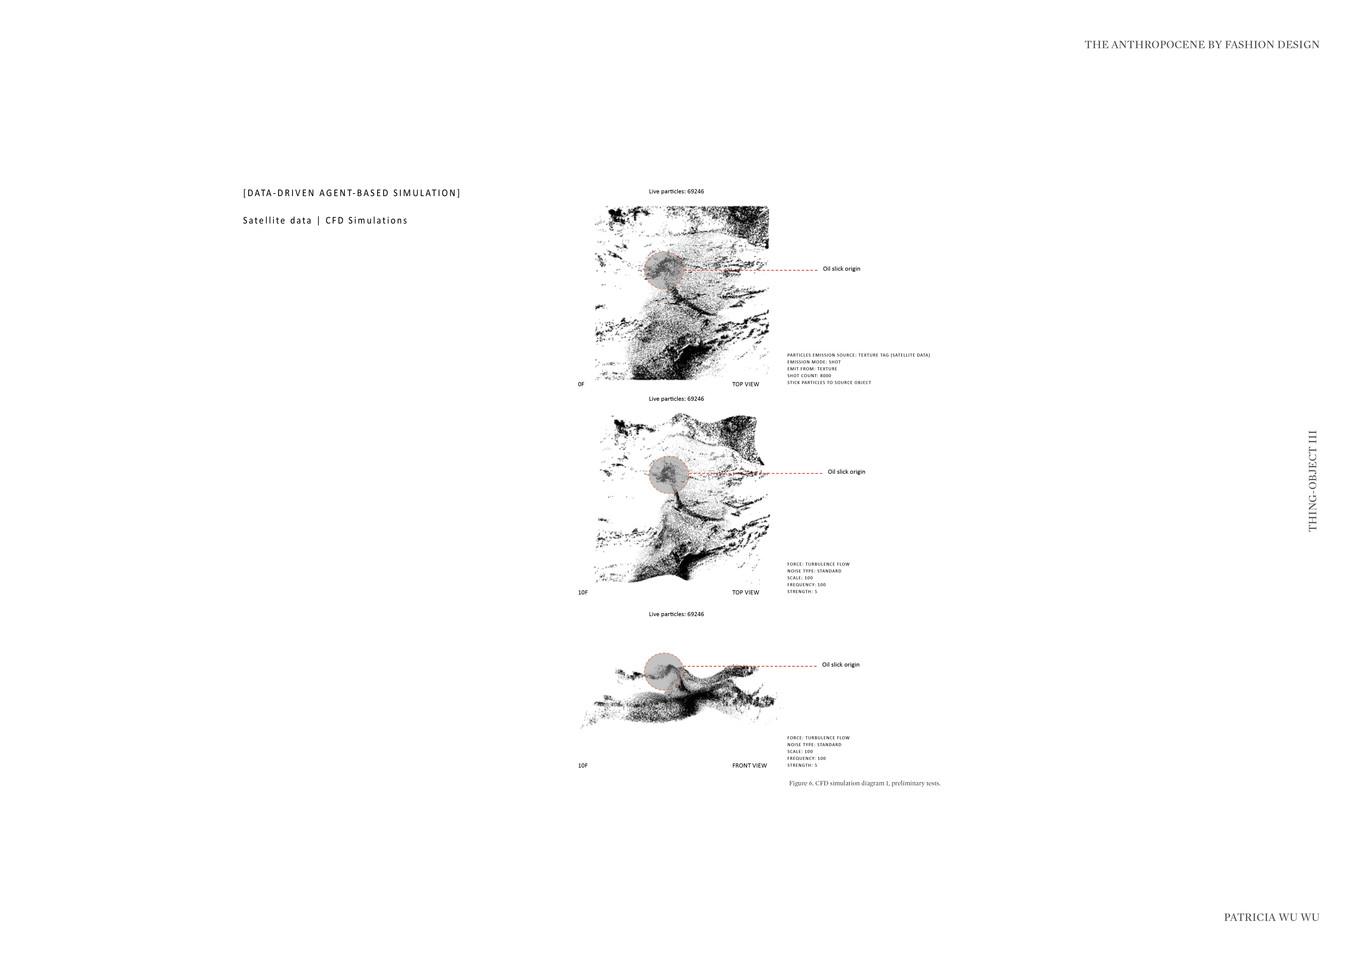 Thing-Object III _portfolio + text 337-34911.jpg